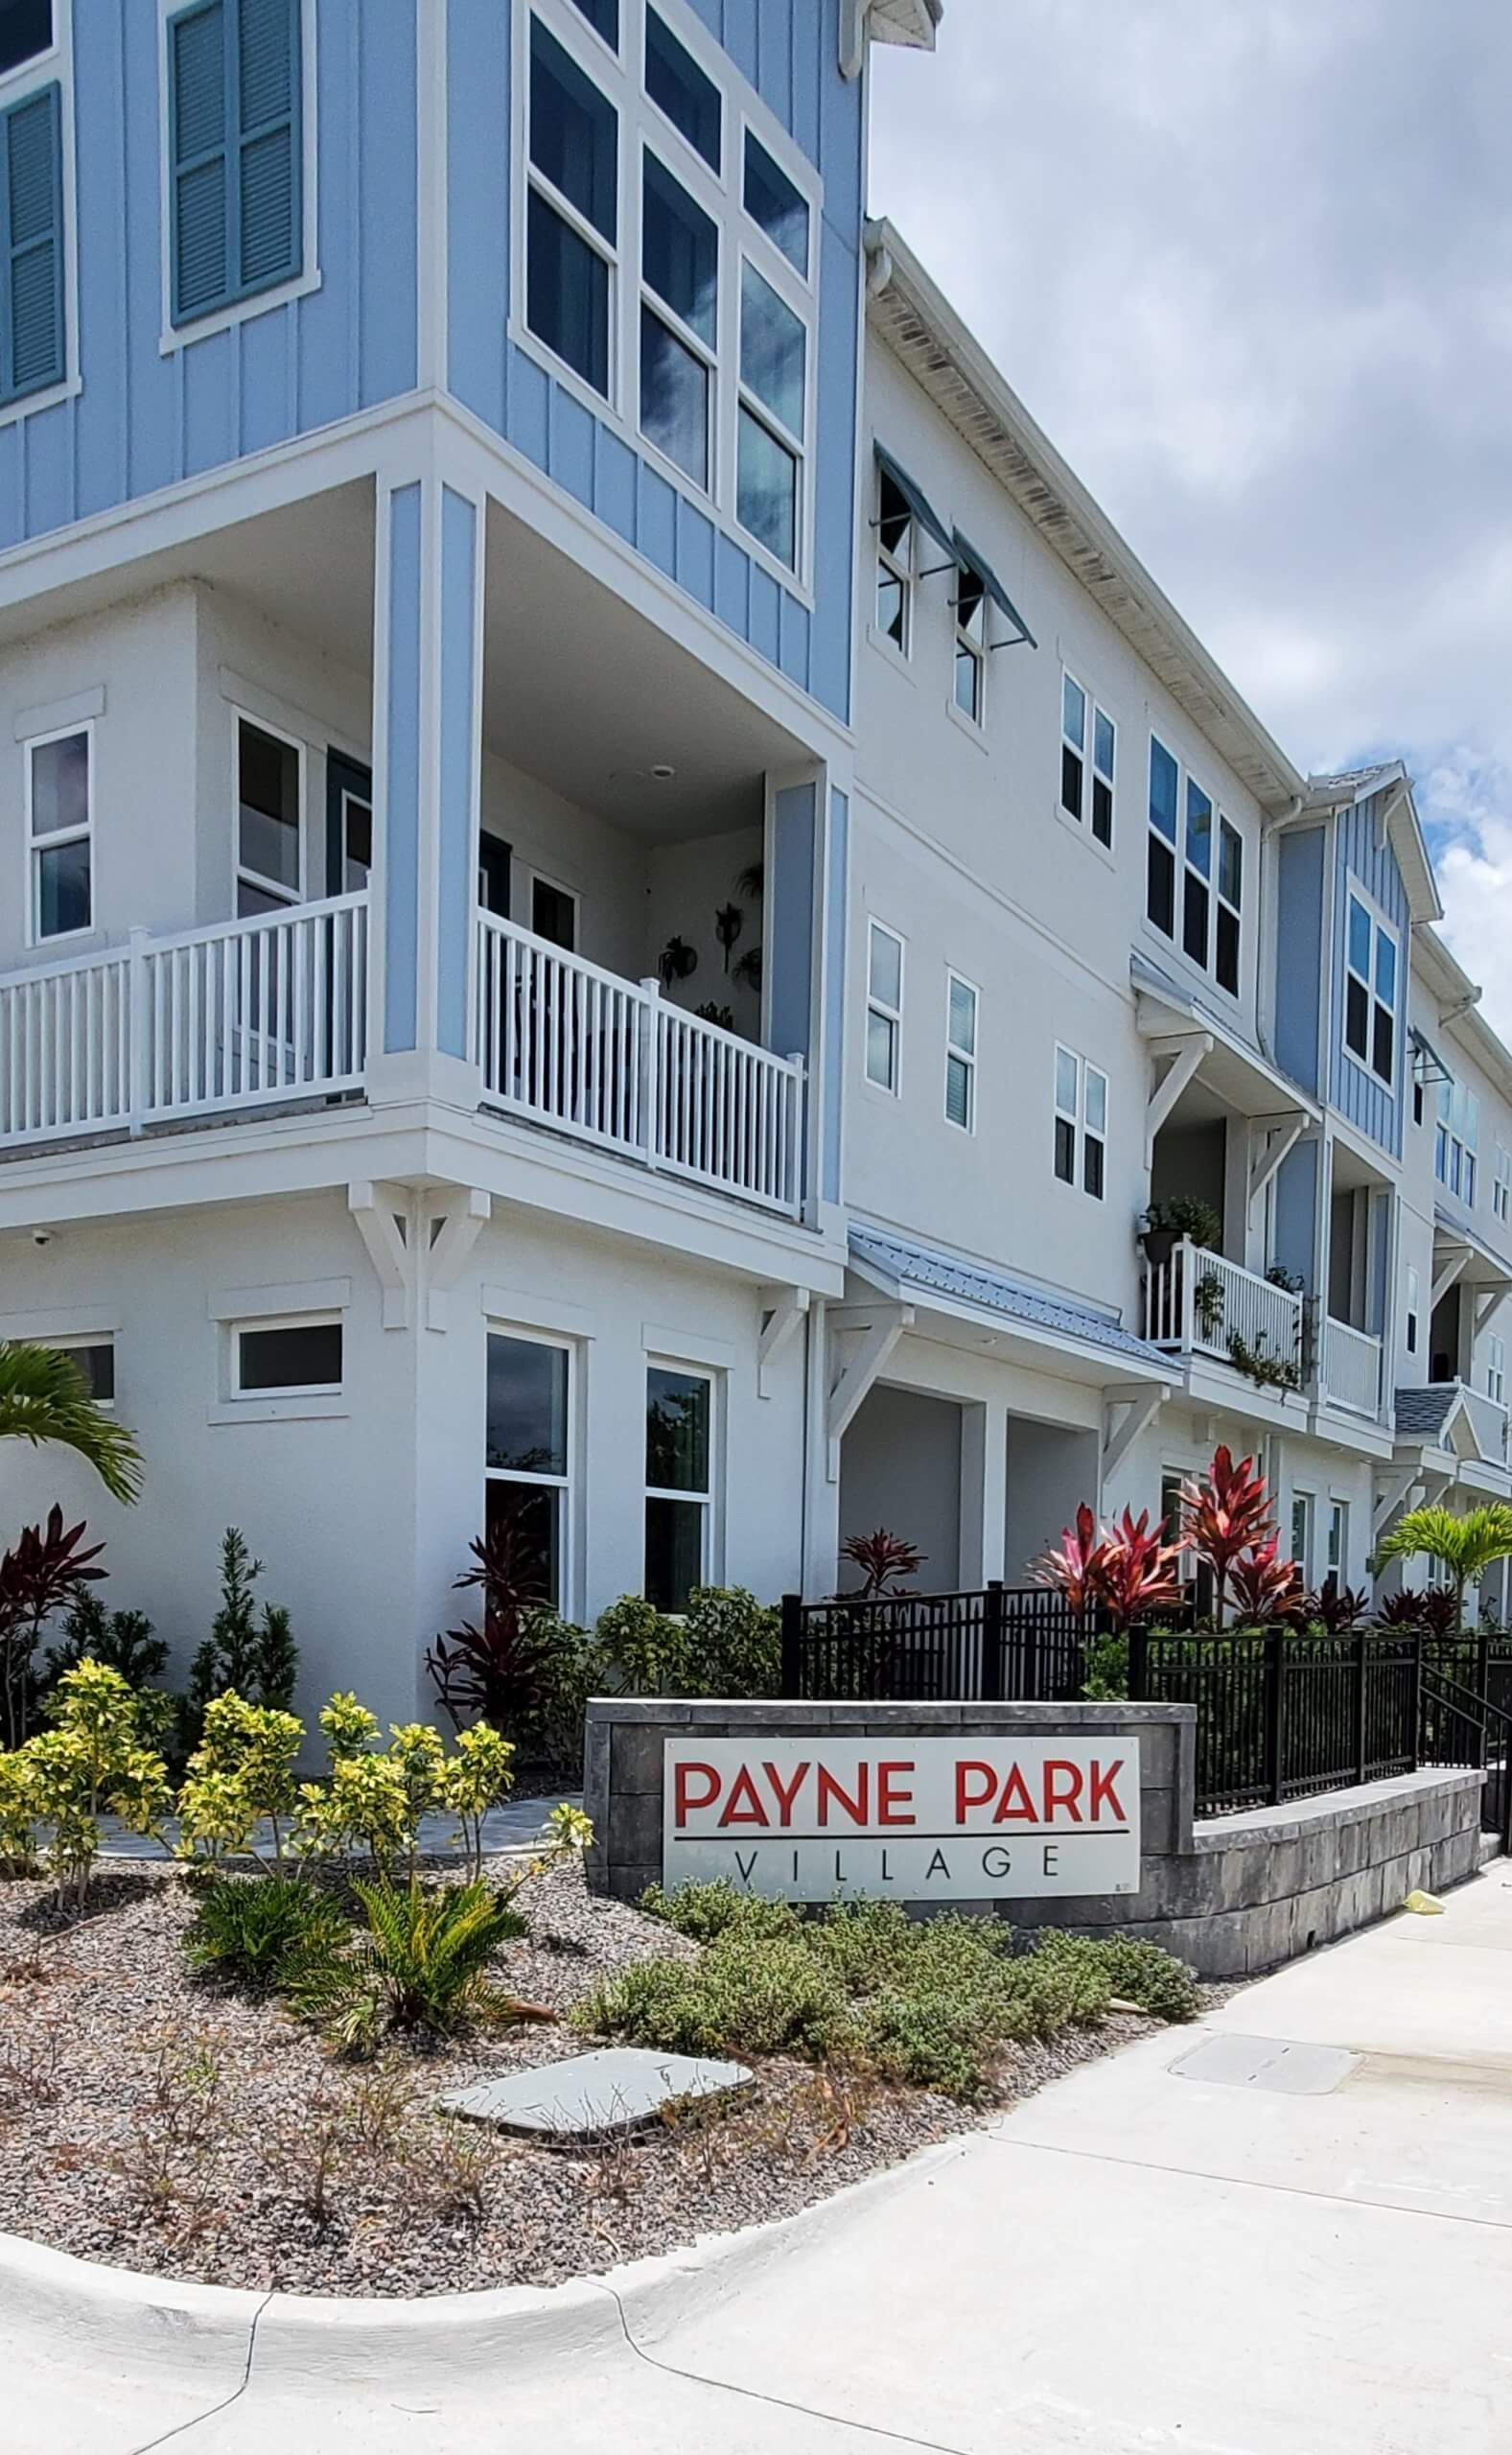 Payne Park Village